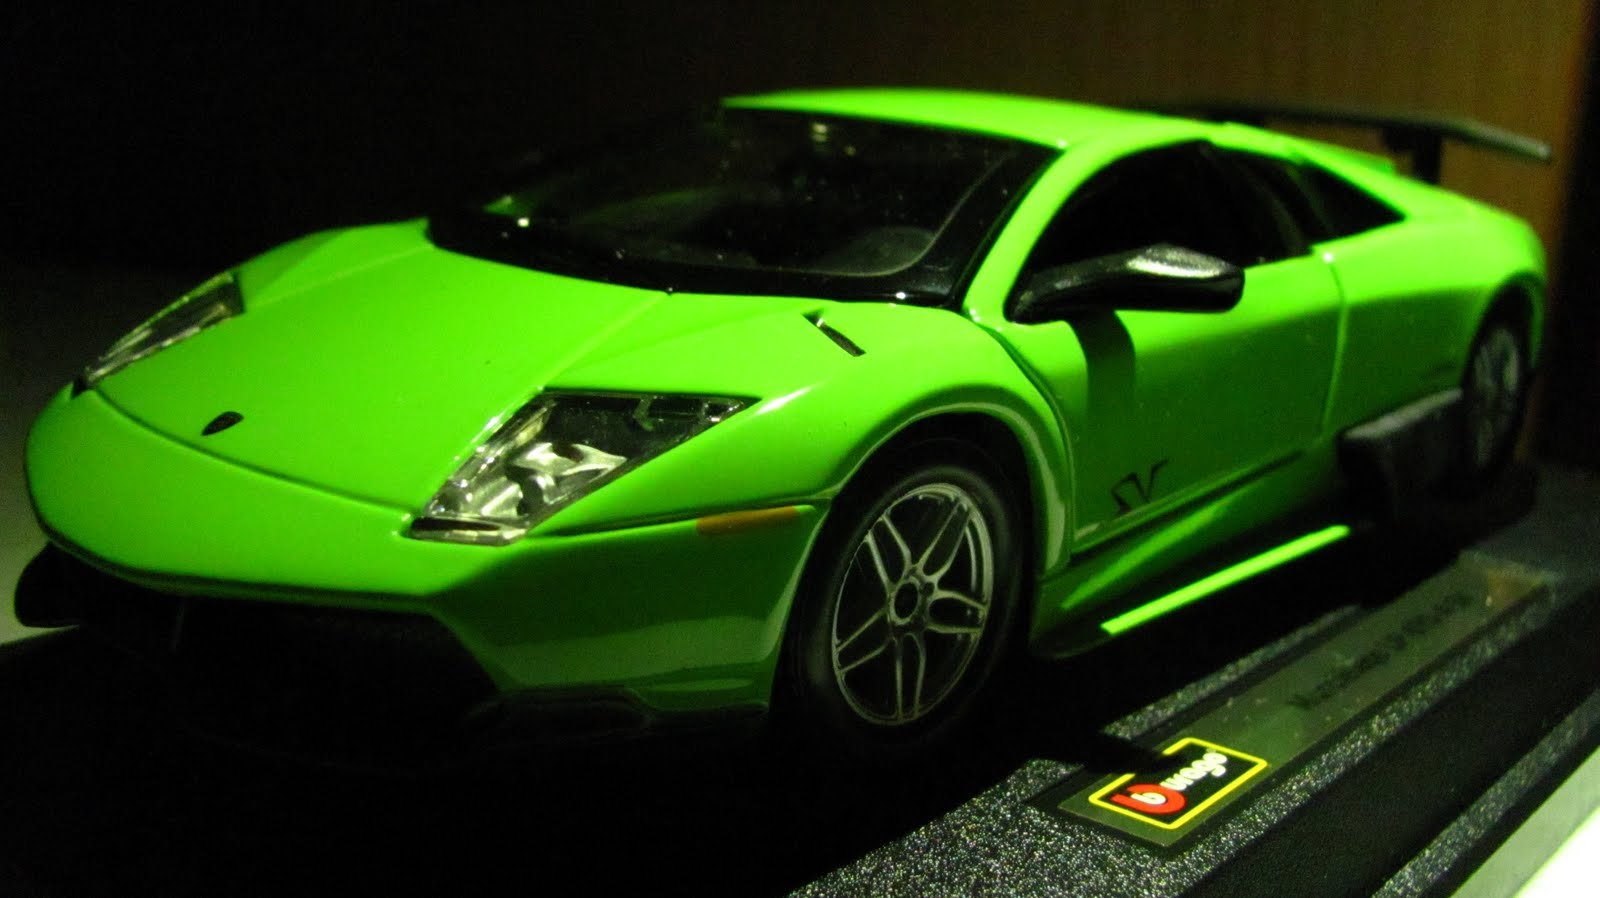 Neil S Moto Musings My Garage Lamborghini Murcielago Lp 670 4